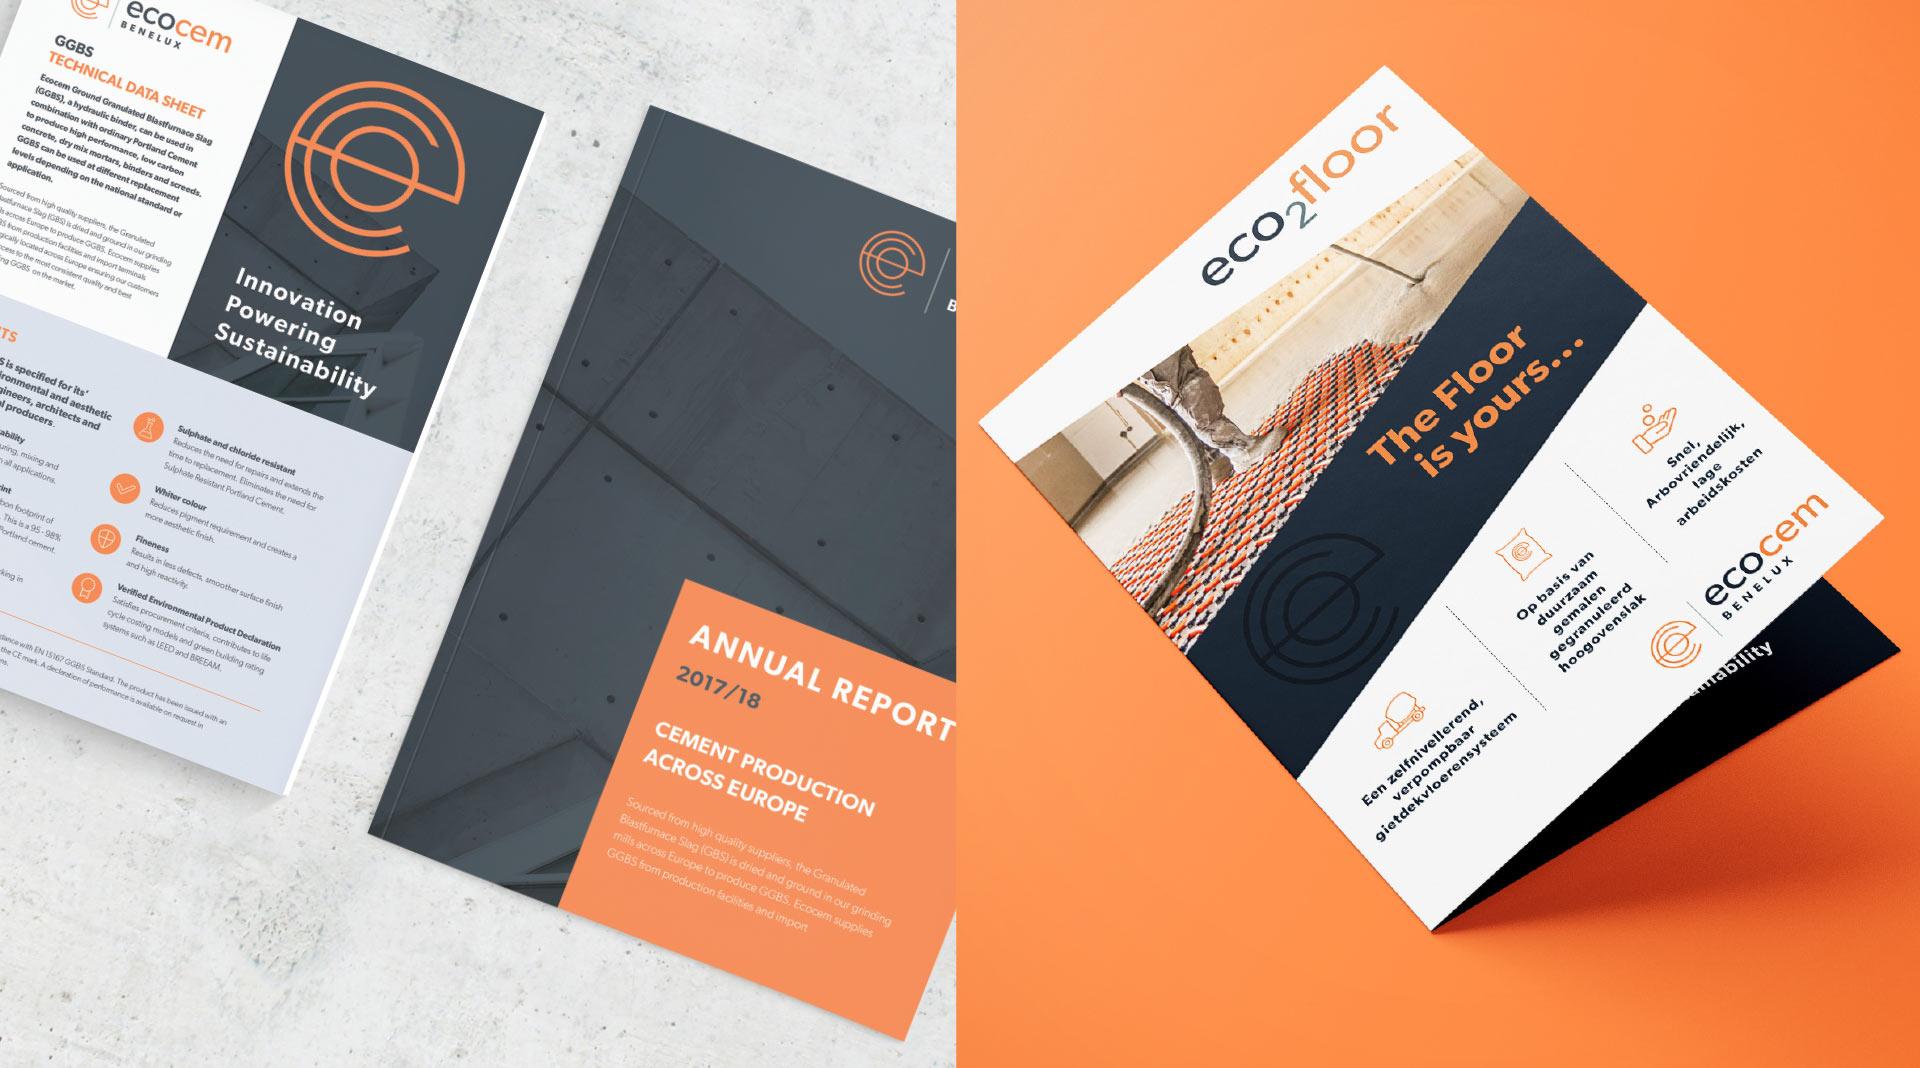 Ecocem Benelux brochure design